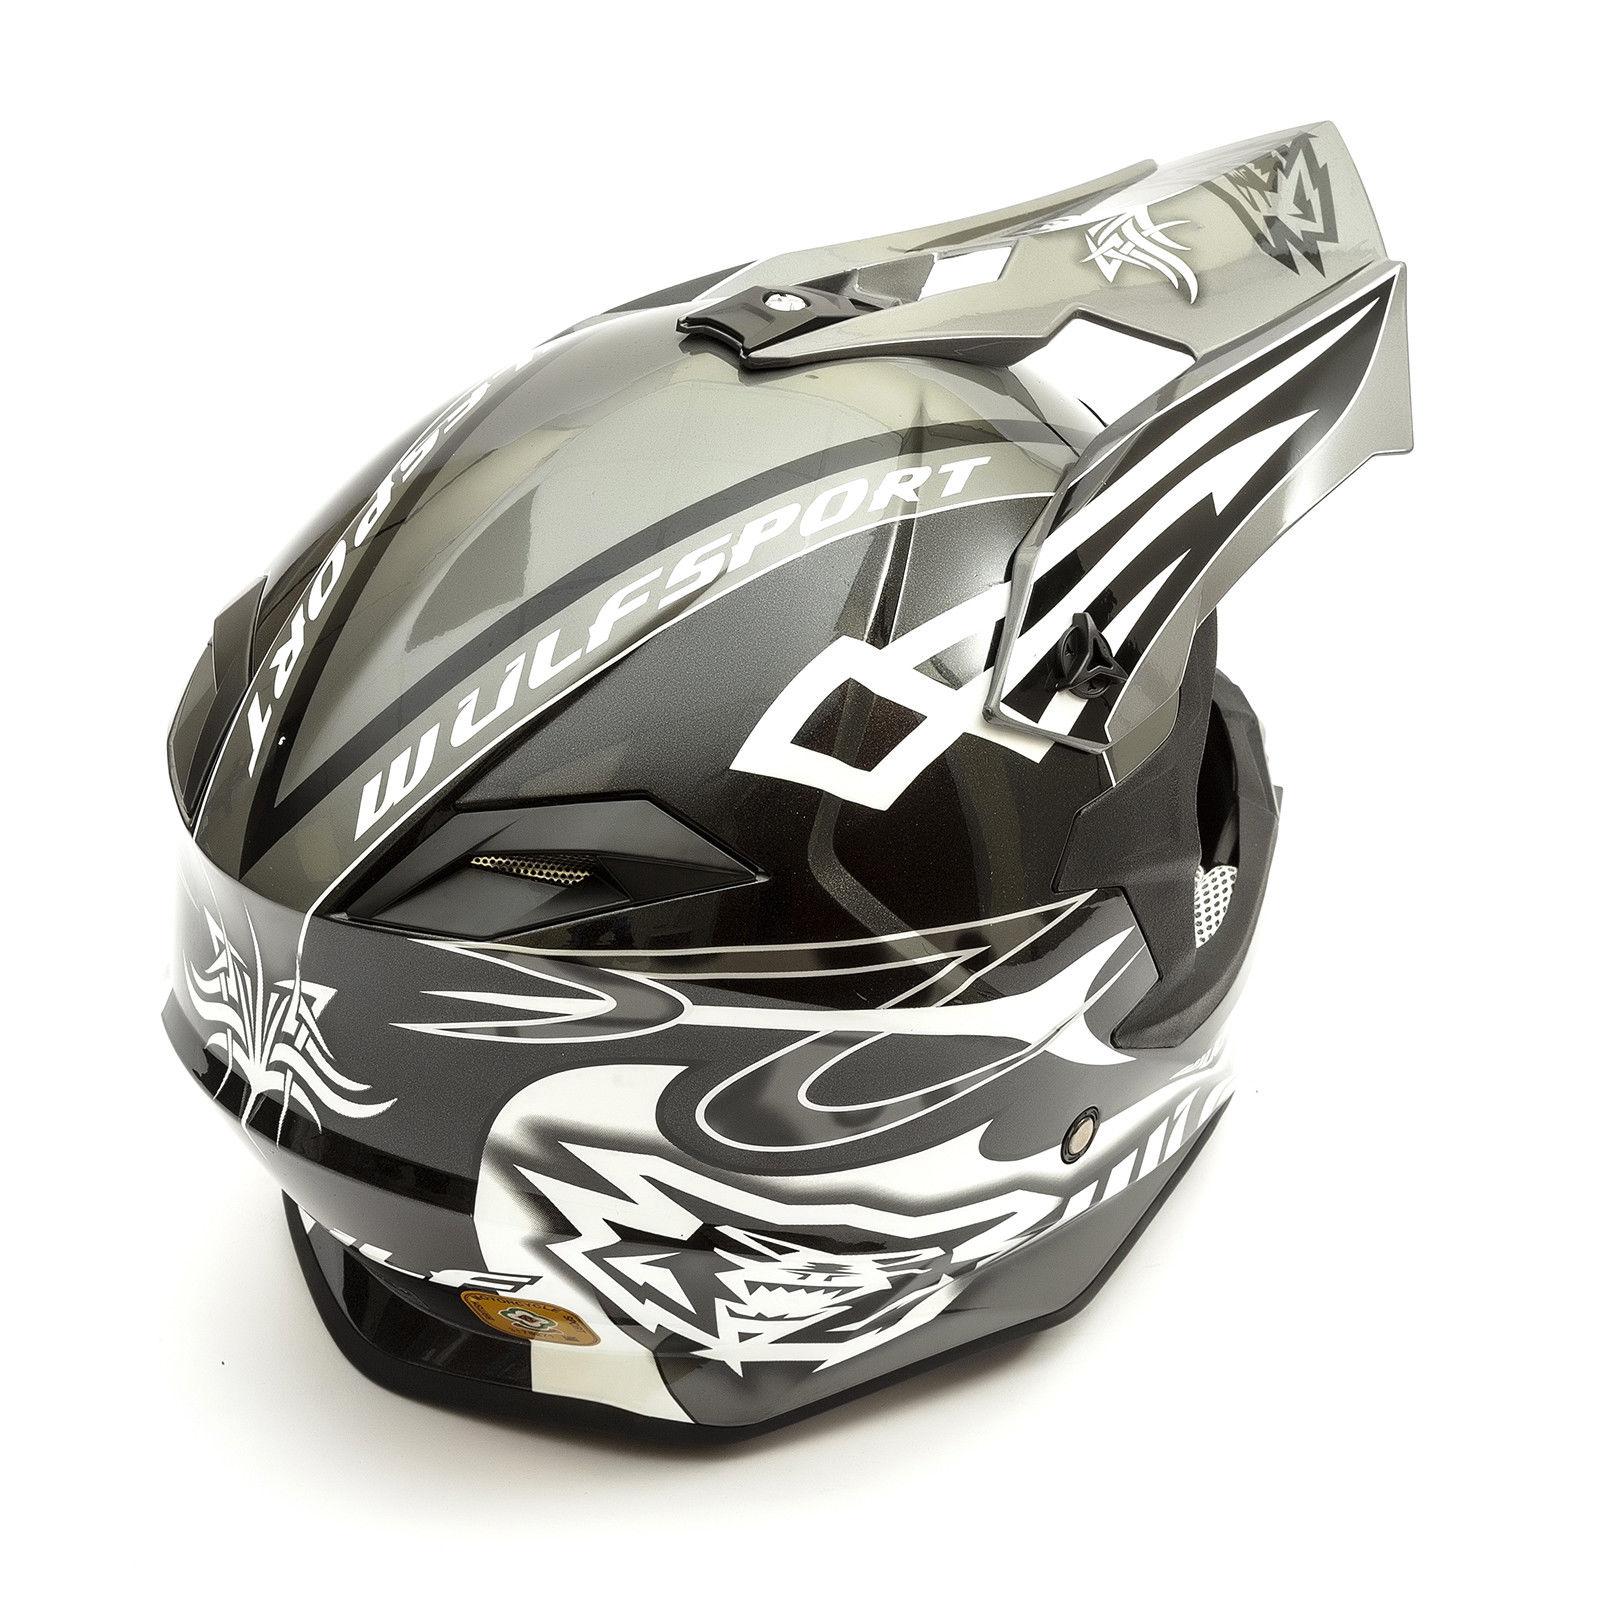 Wulfsport-Adult-Sceptre-Helmets-Motocross-Pitbike-Motorbike-Off-Road-Racing-ATV thumbnail 7